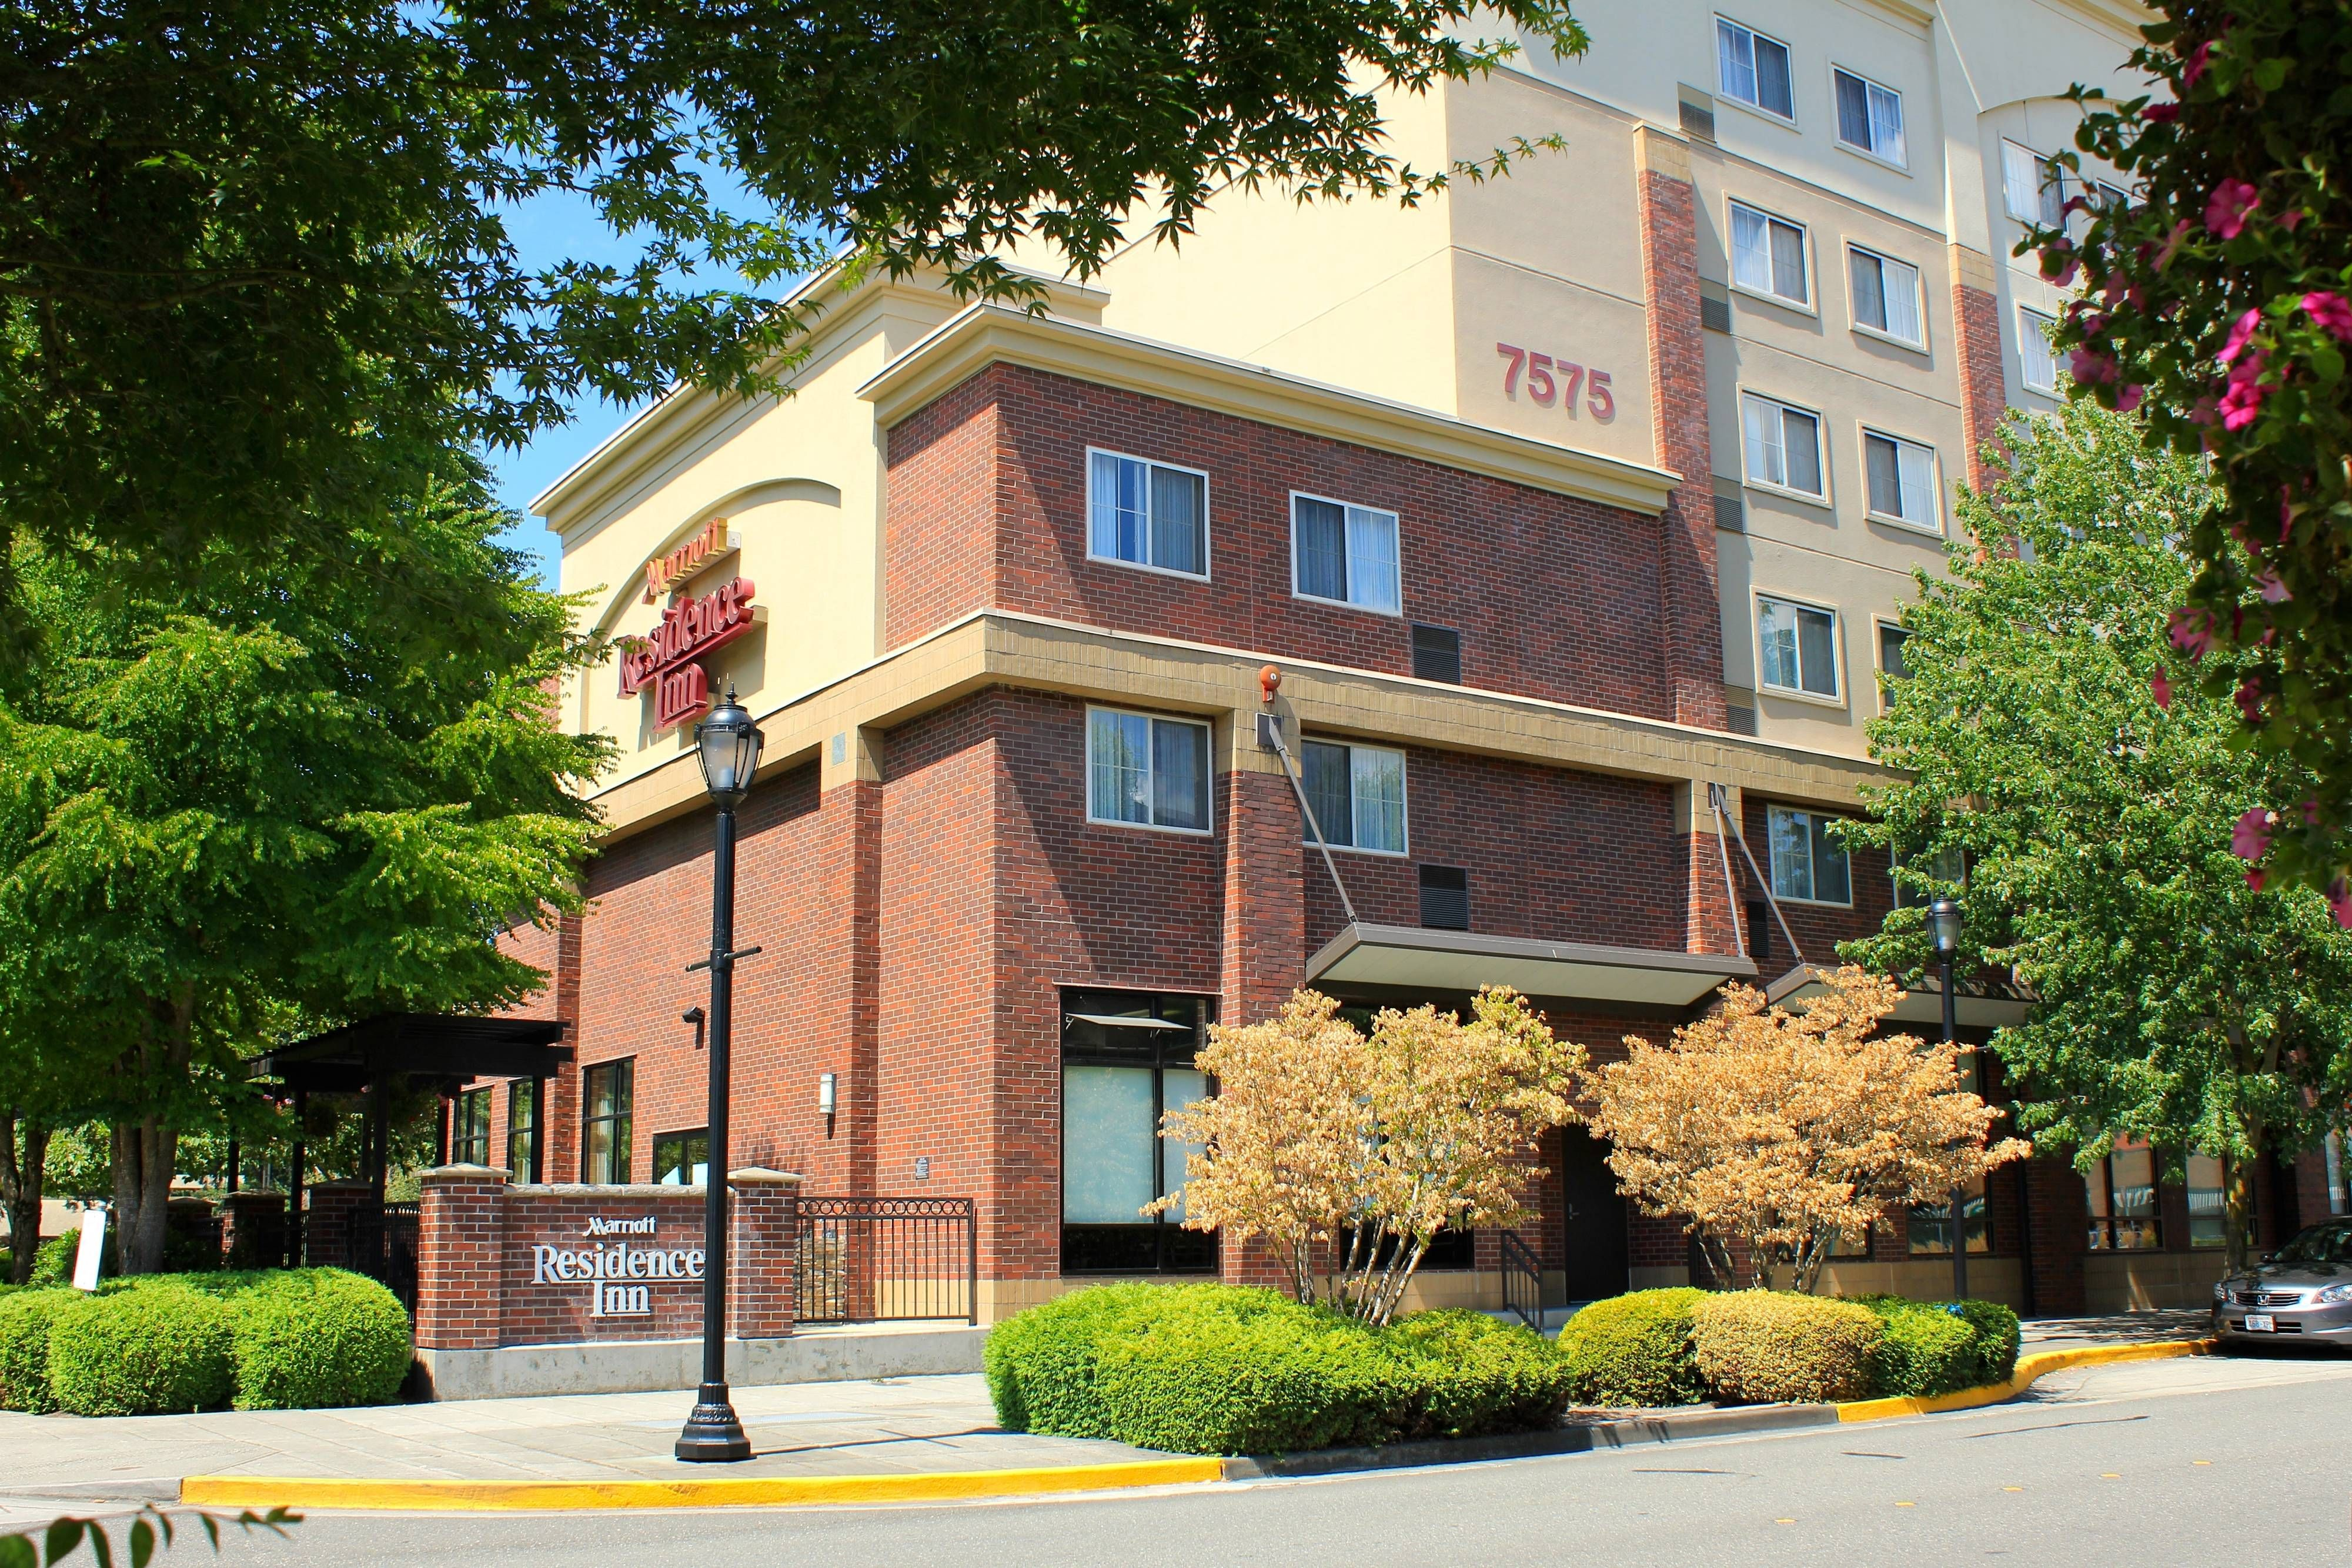 Residence Inn Seattle East Redmond Exterior Hotels Comfortable